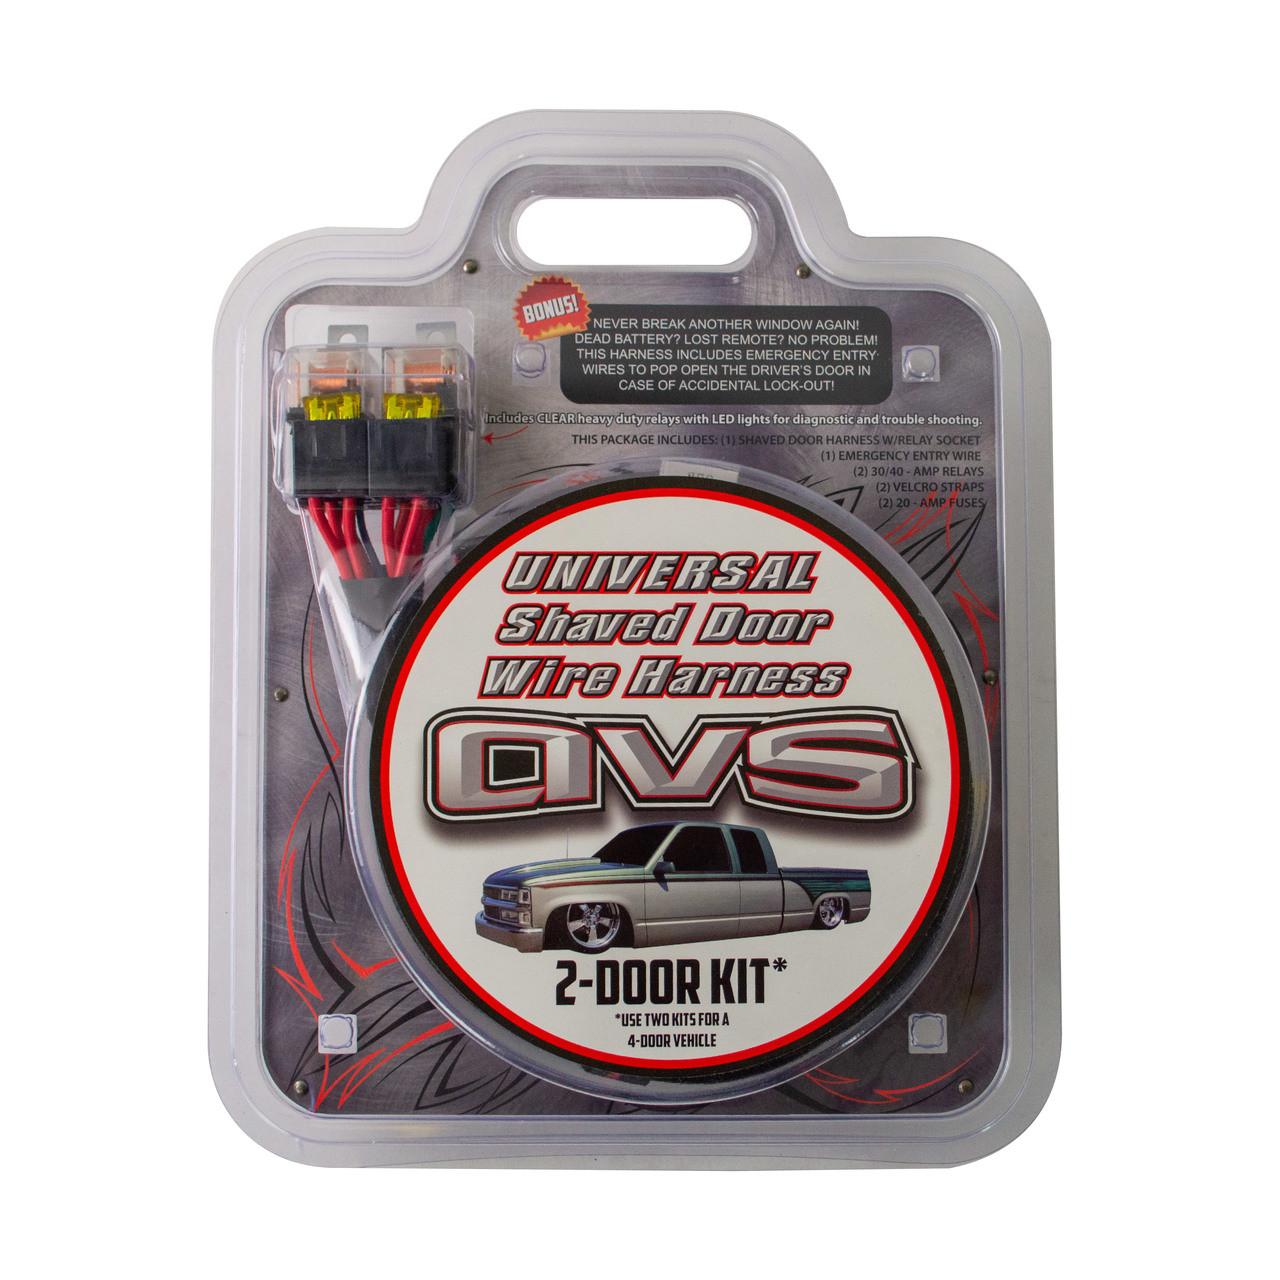 avs shaved door relay wiring harness plug n play  [ 1280 x 1280 Pixel ]